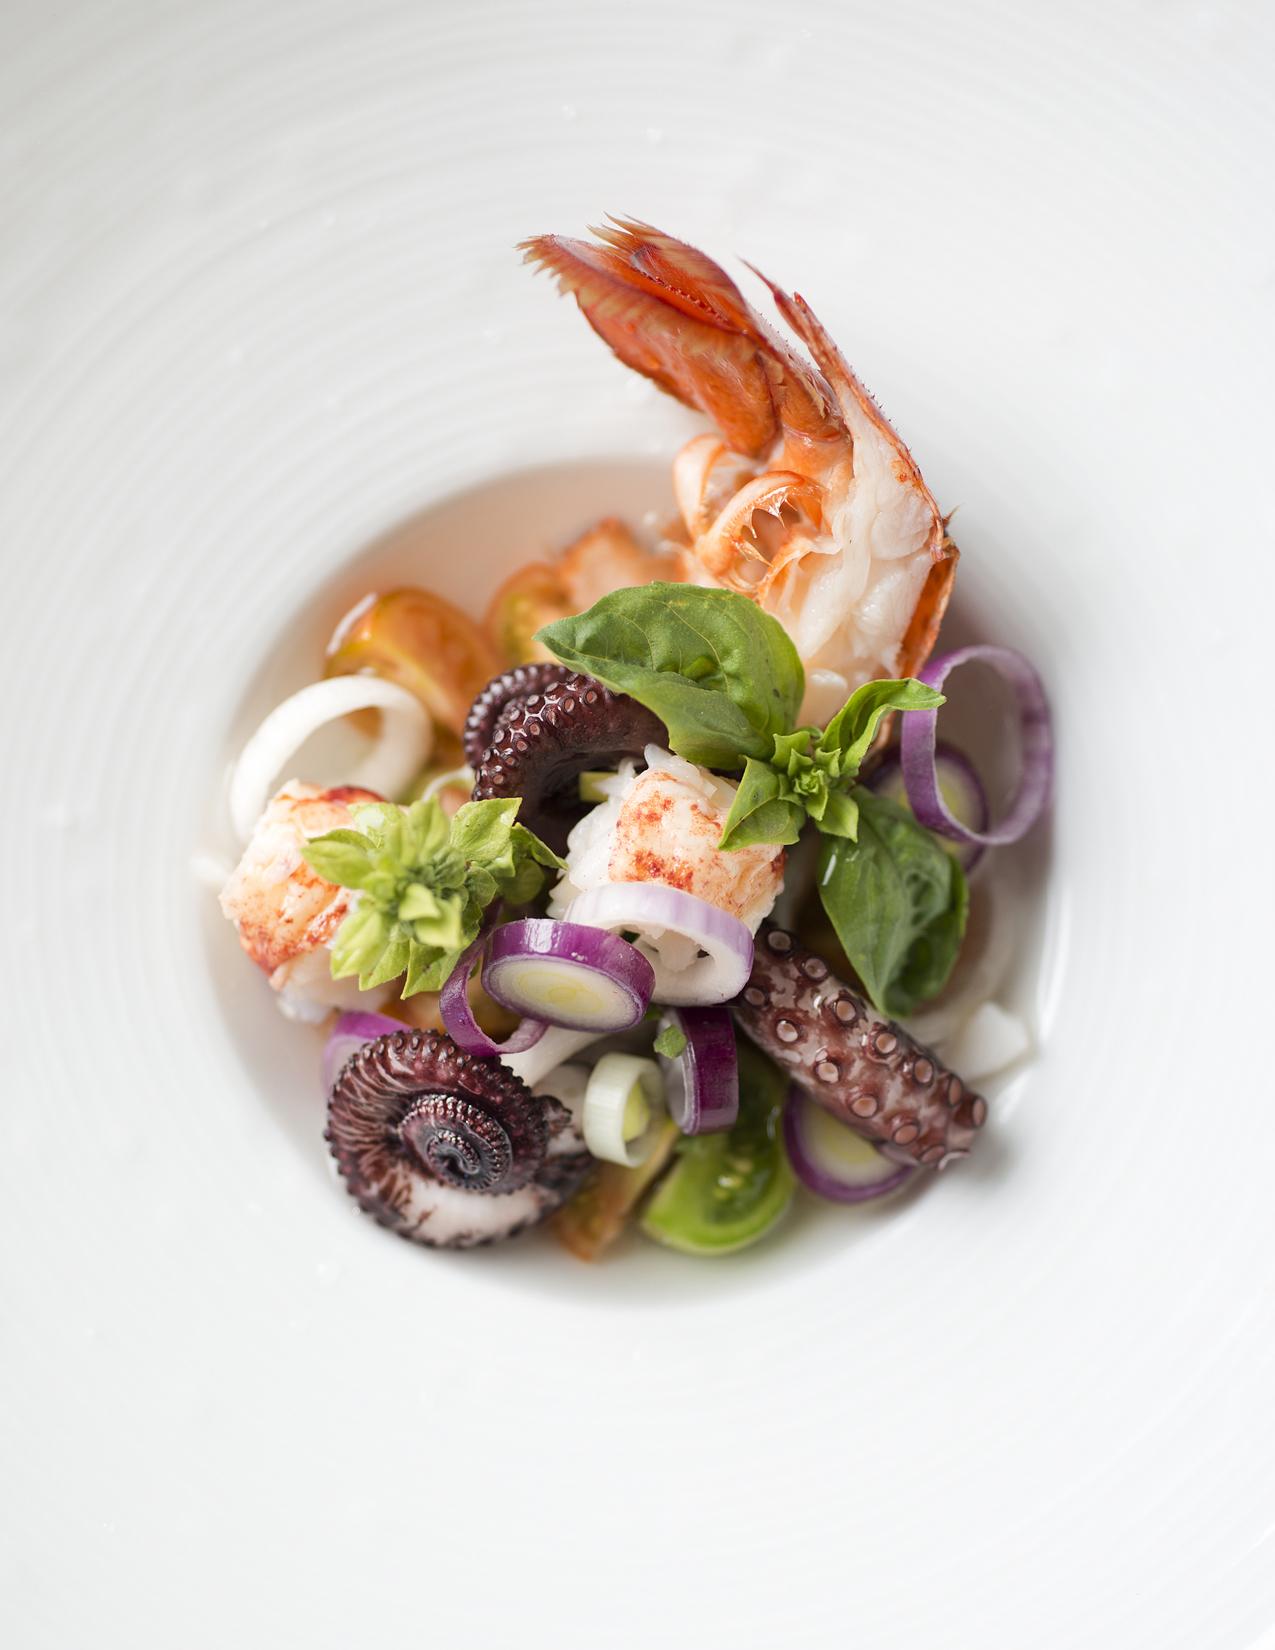 seafood+salad+merriam+restaurant+boston+photo